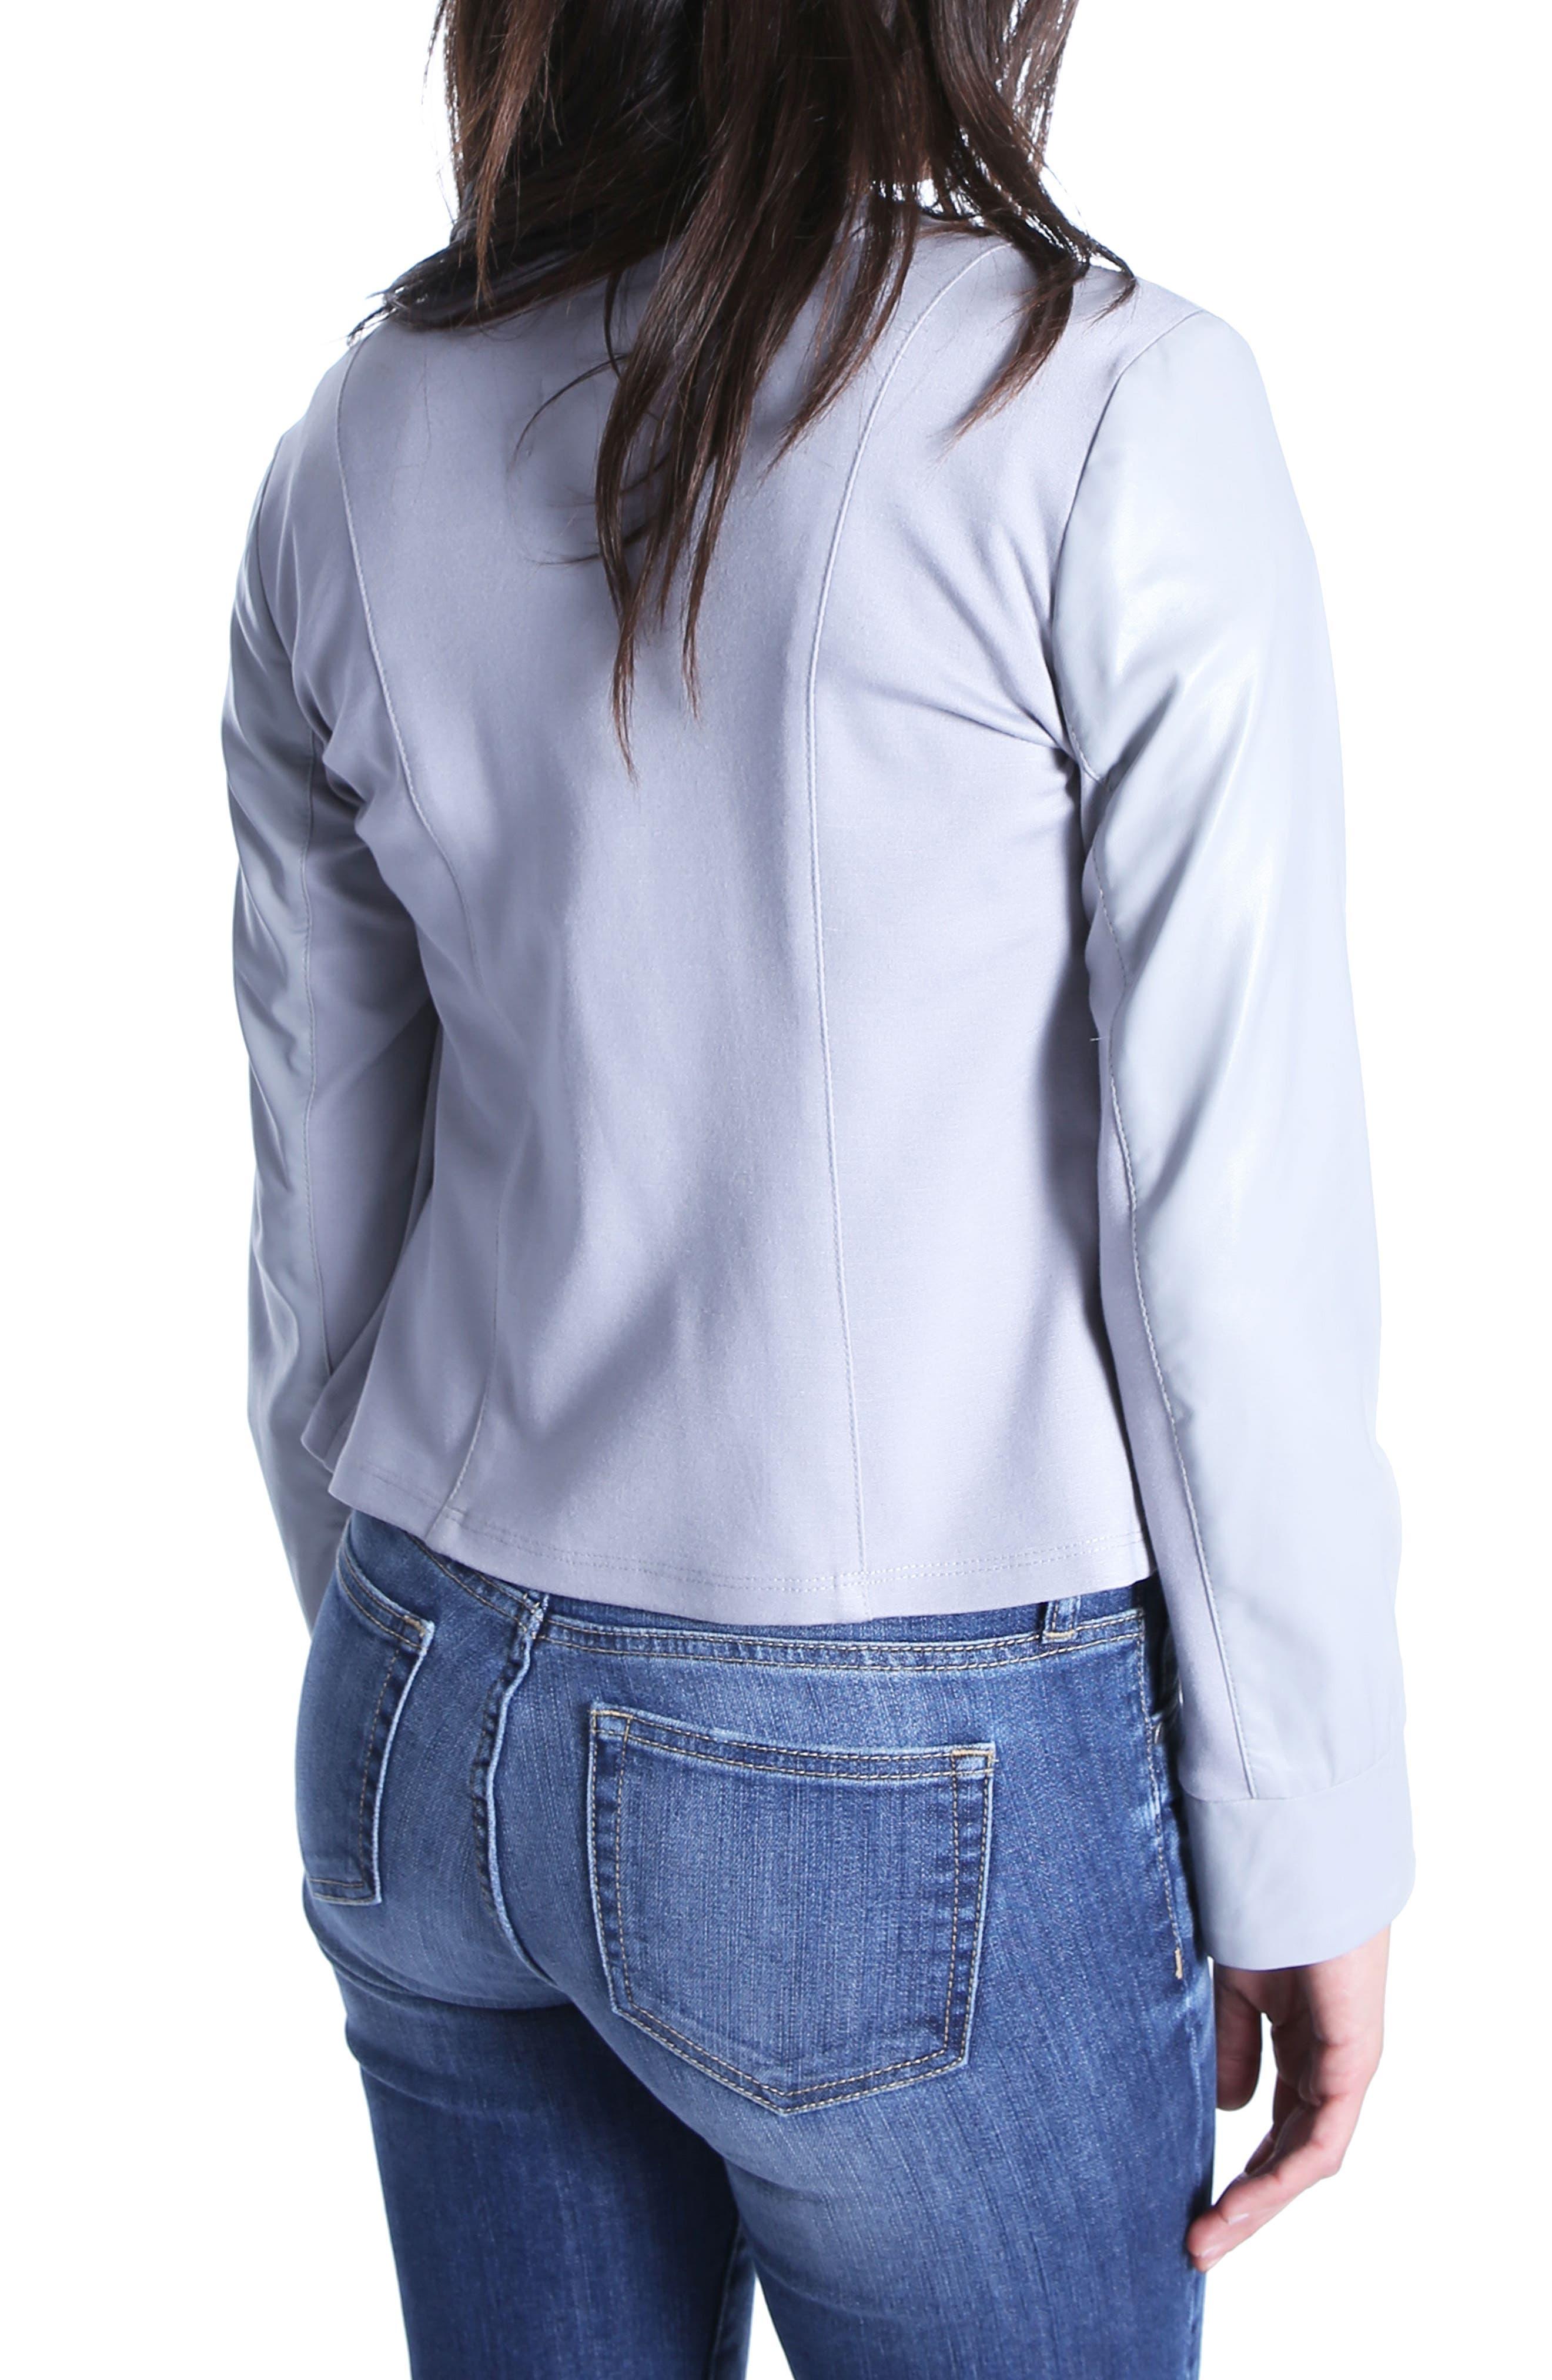 Dahliana Faux Leather Jacket,                             Alternate thumbnail 2, color,                             Grey